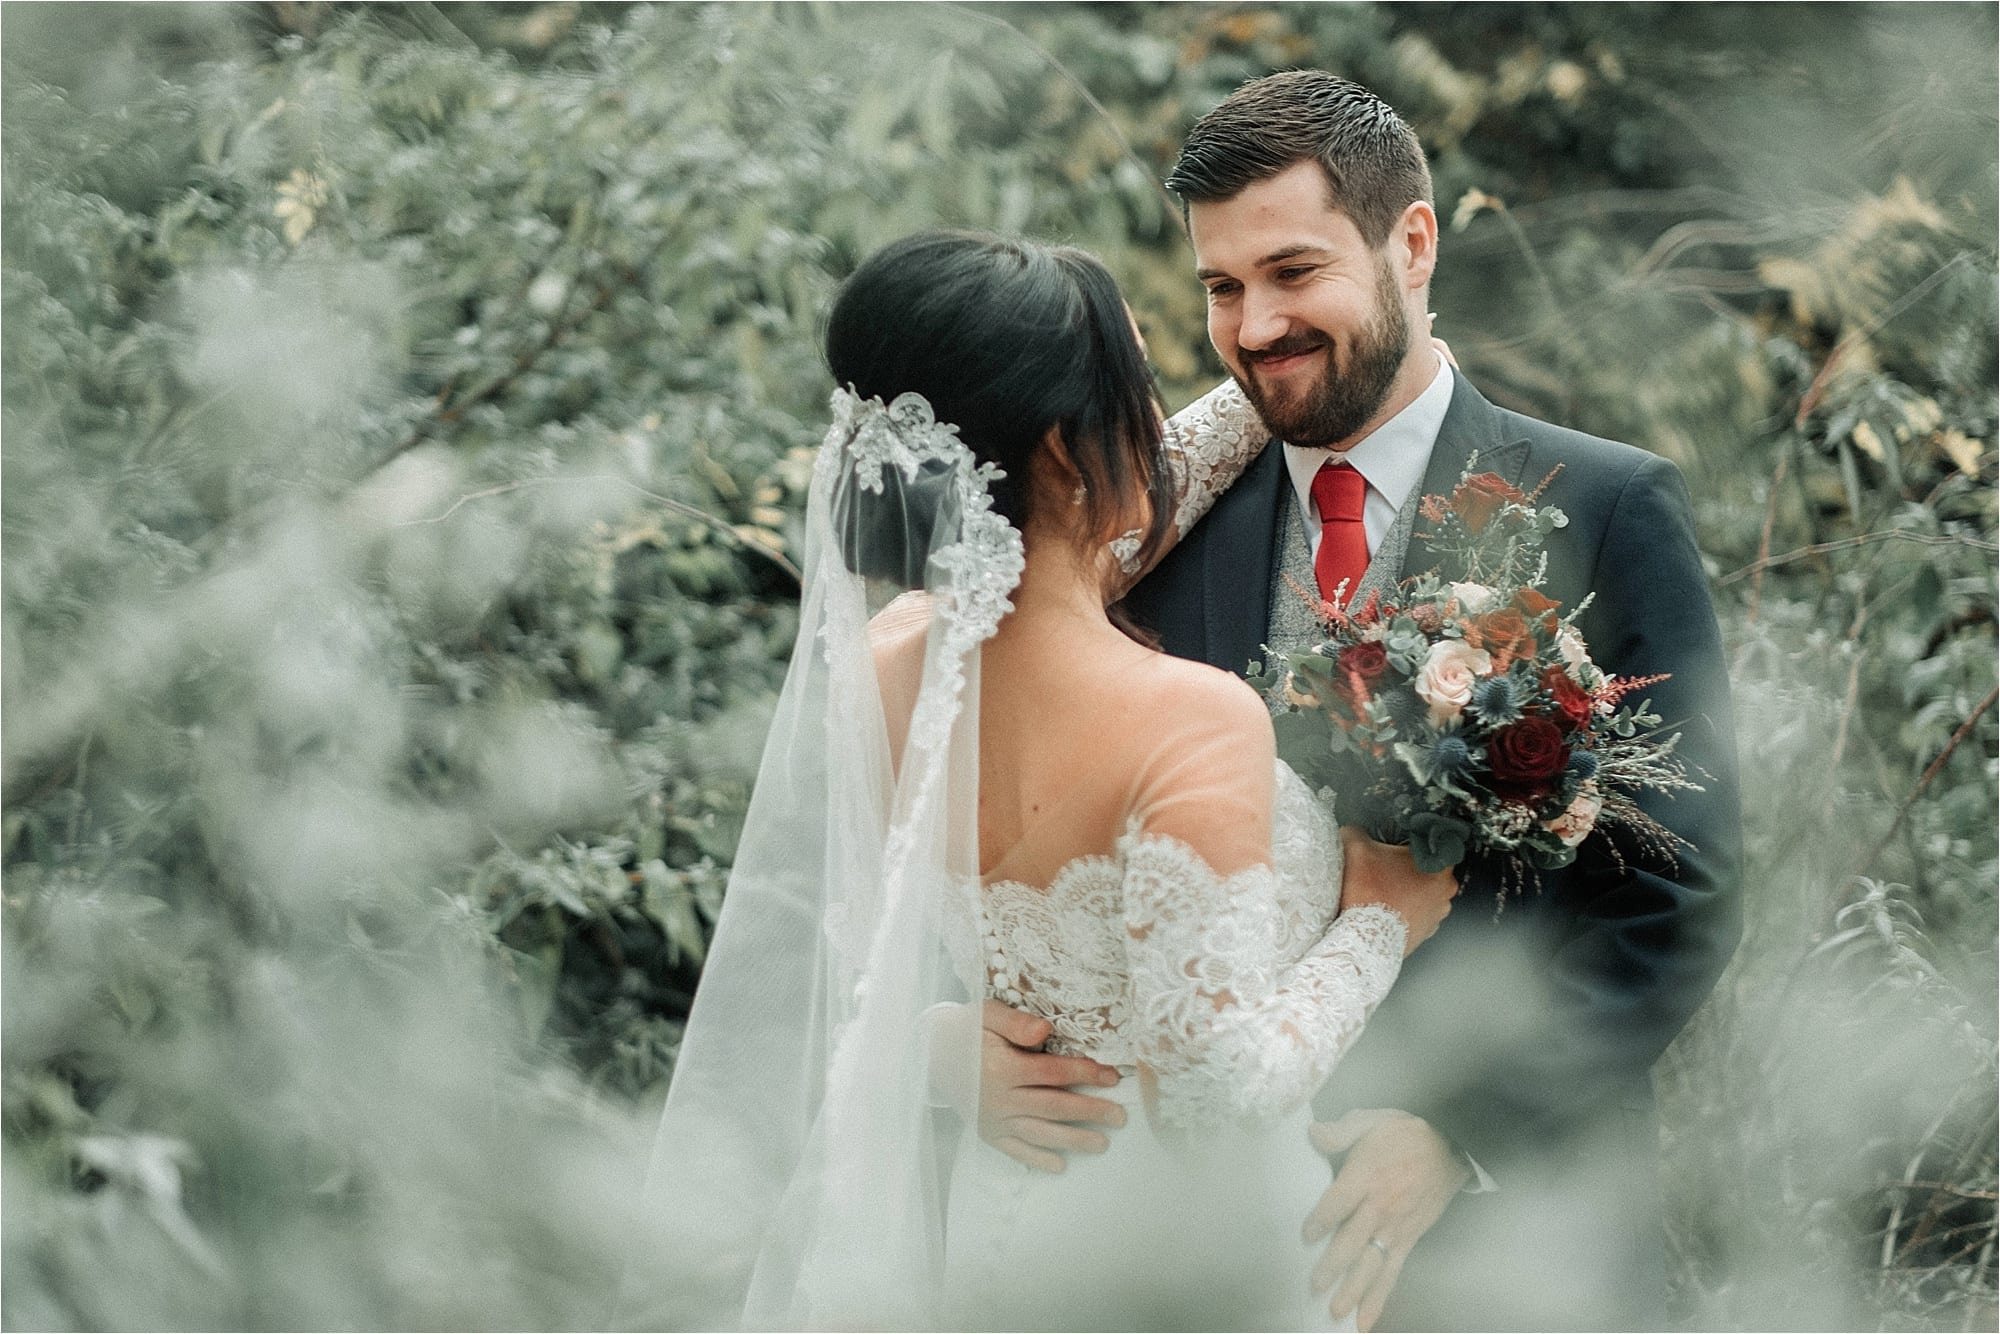 The Great Barn wedding photography